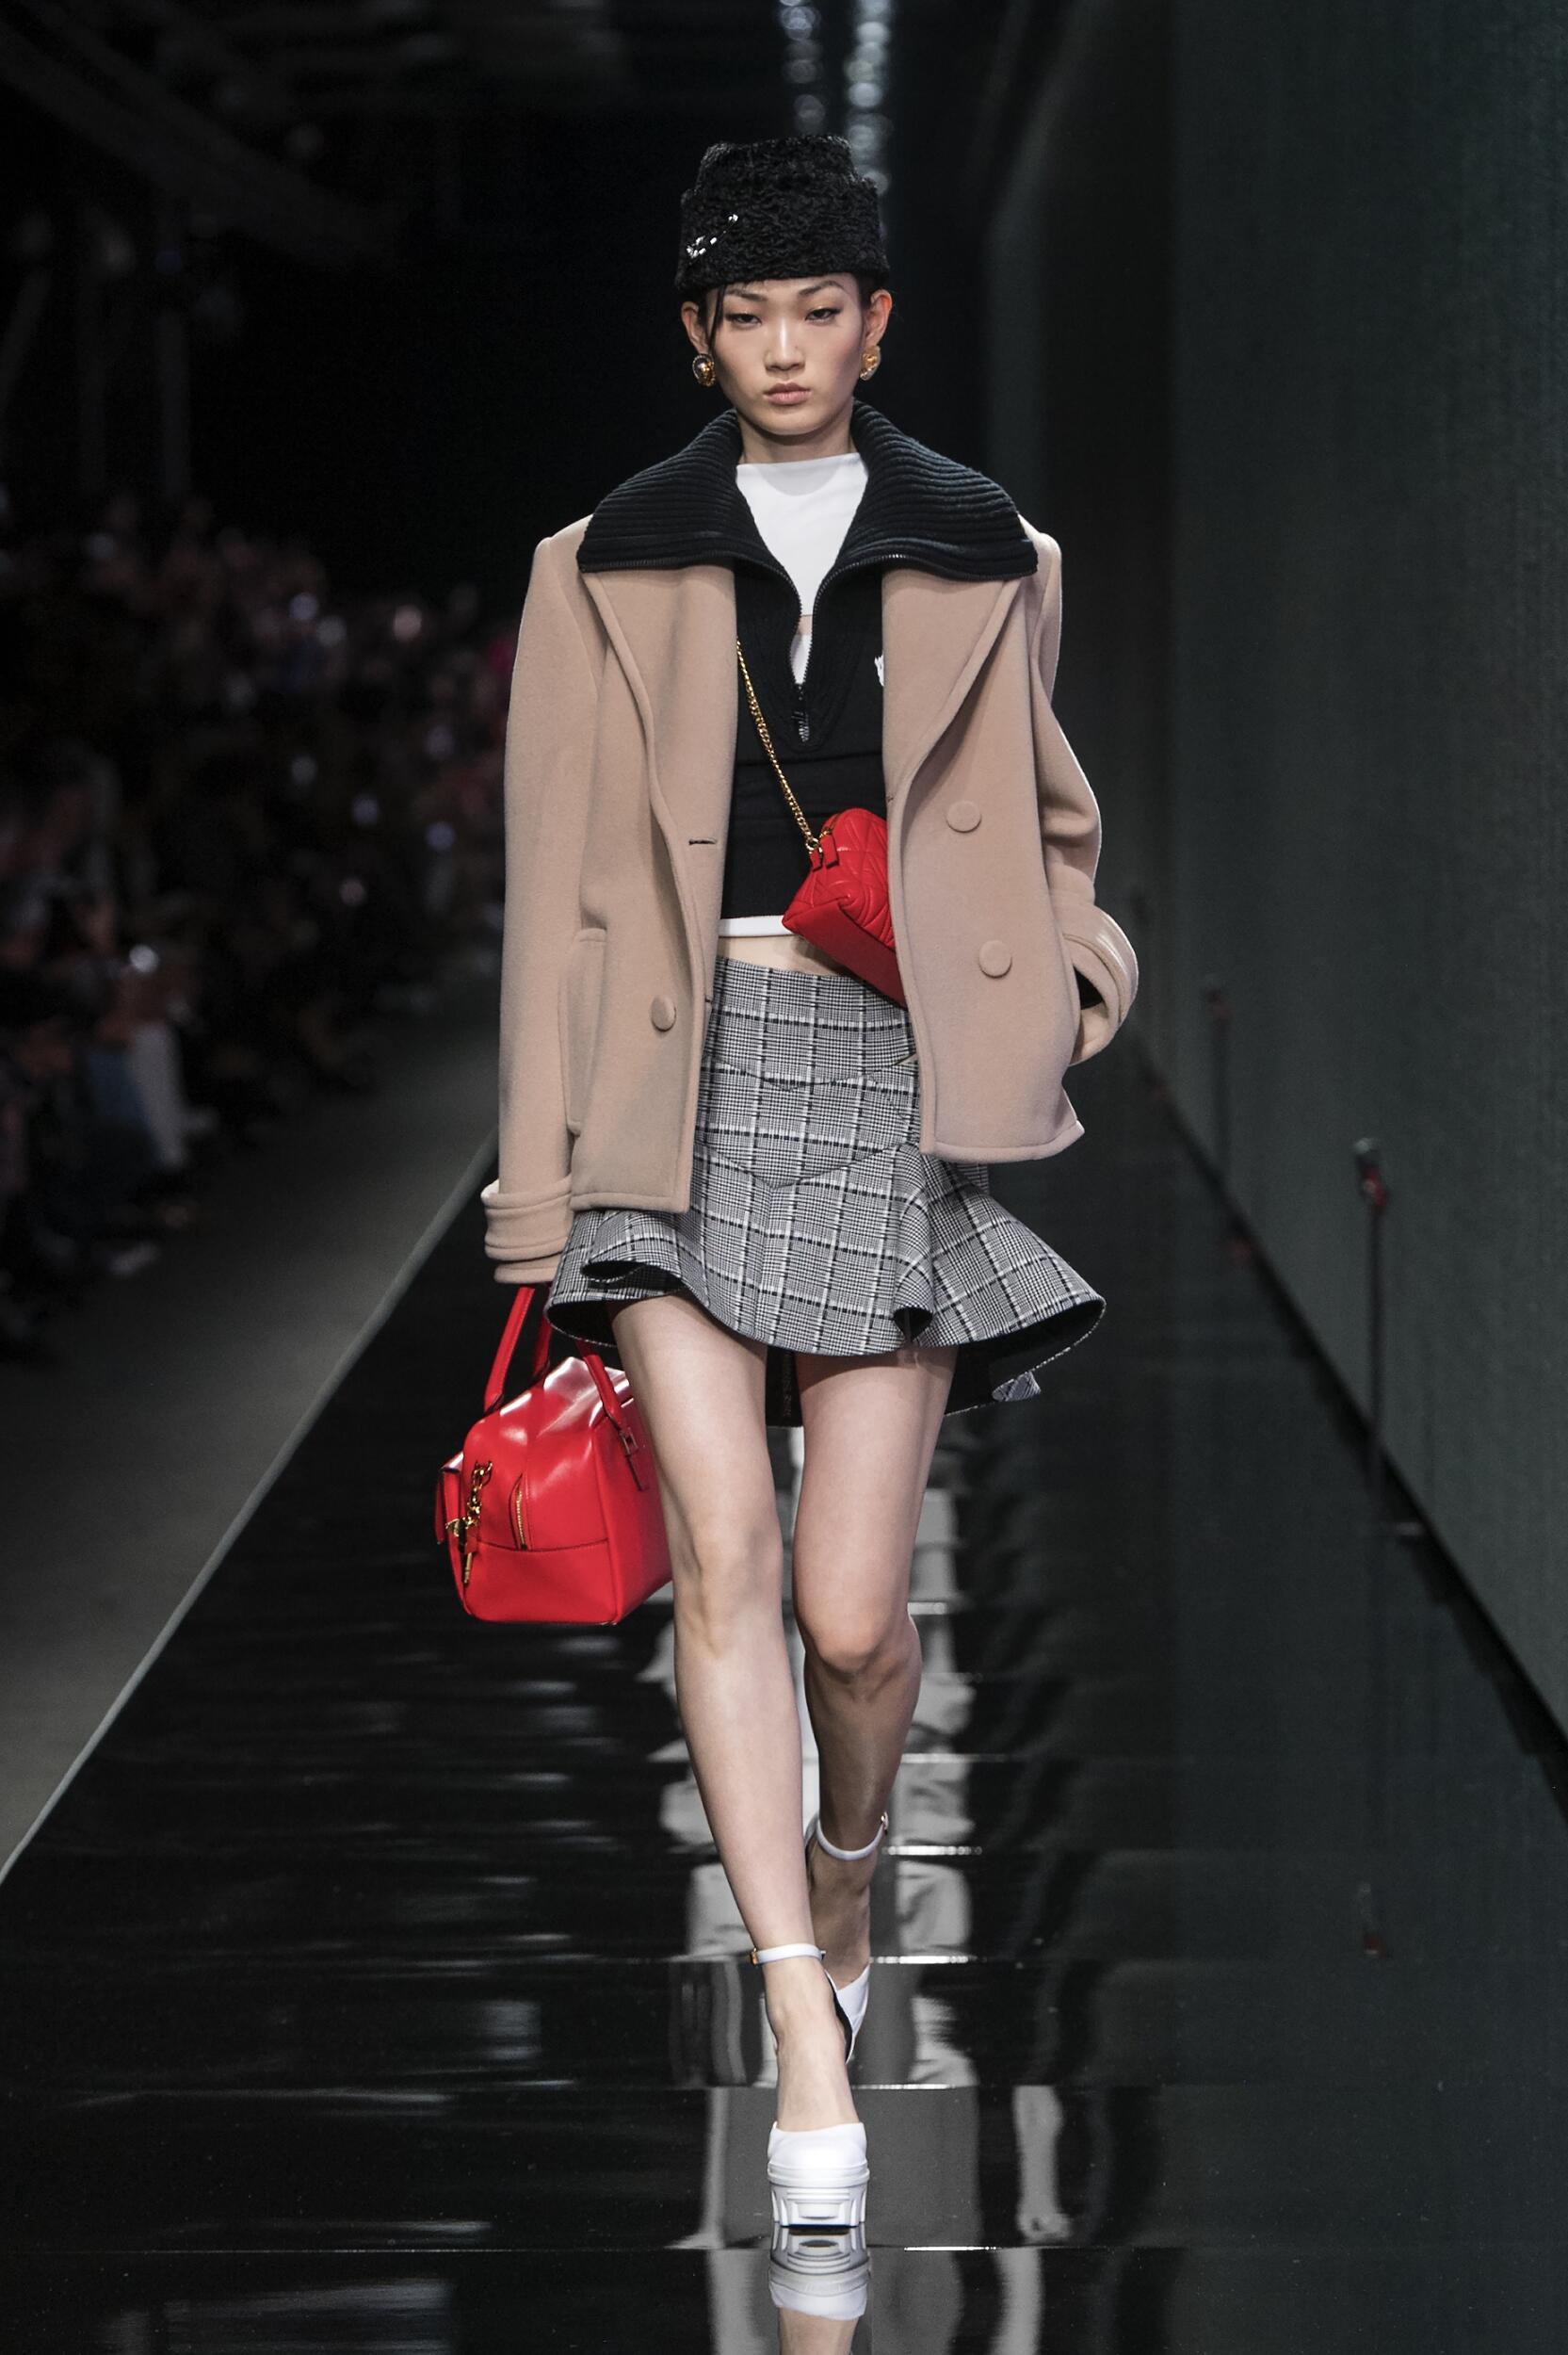 Catwalk Versace Women Fashion Show Winter 2020